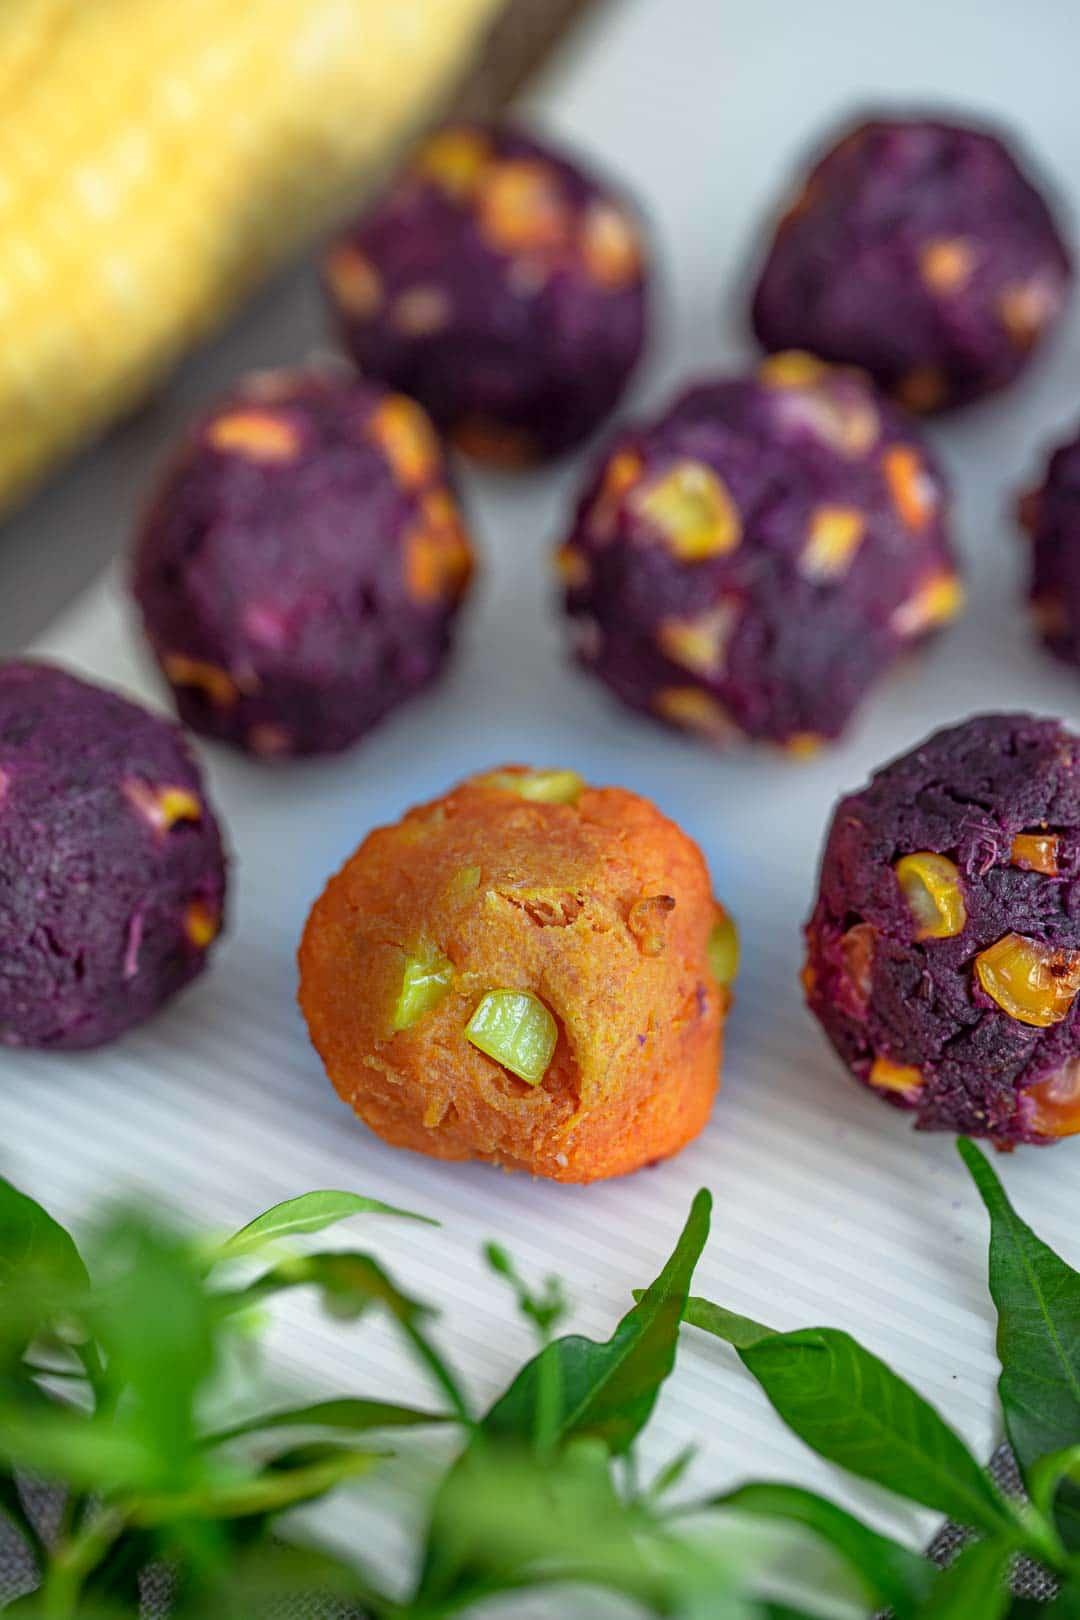 popular Thai grilled sweet potato snack